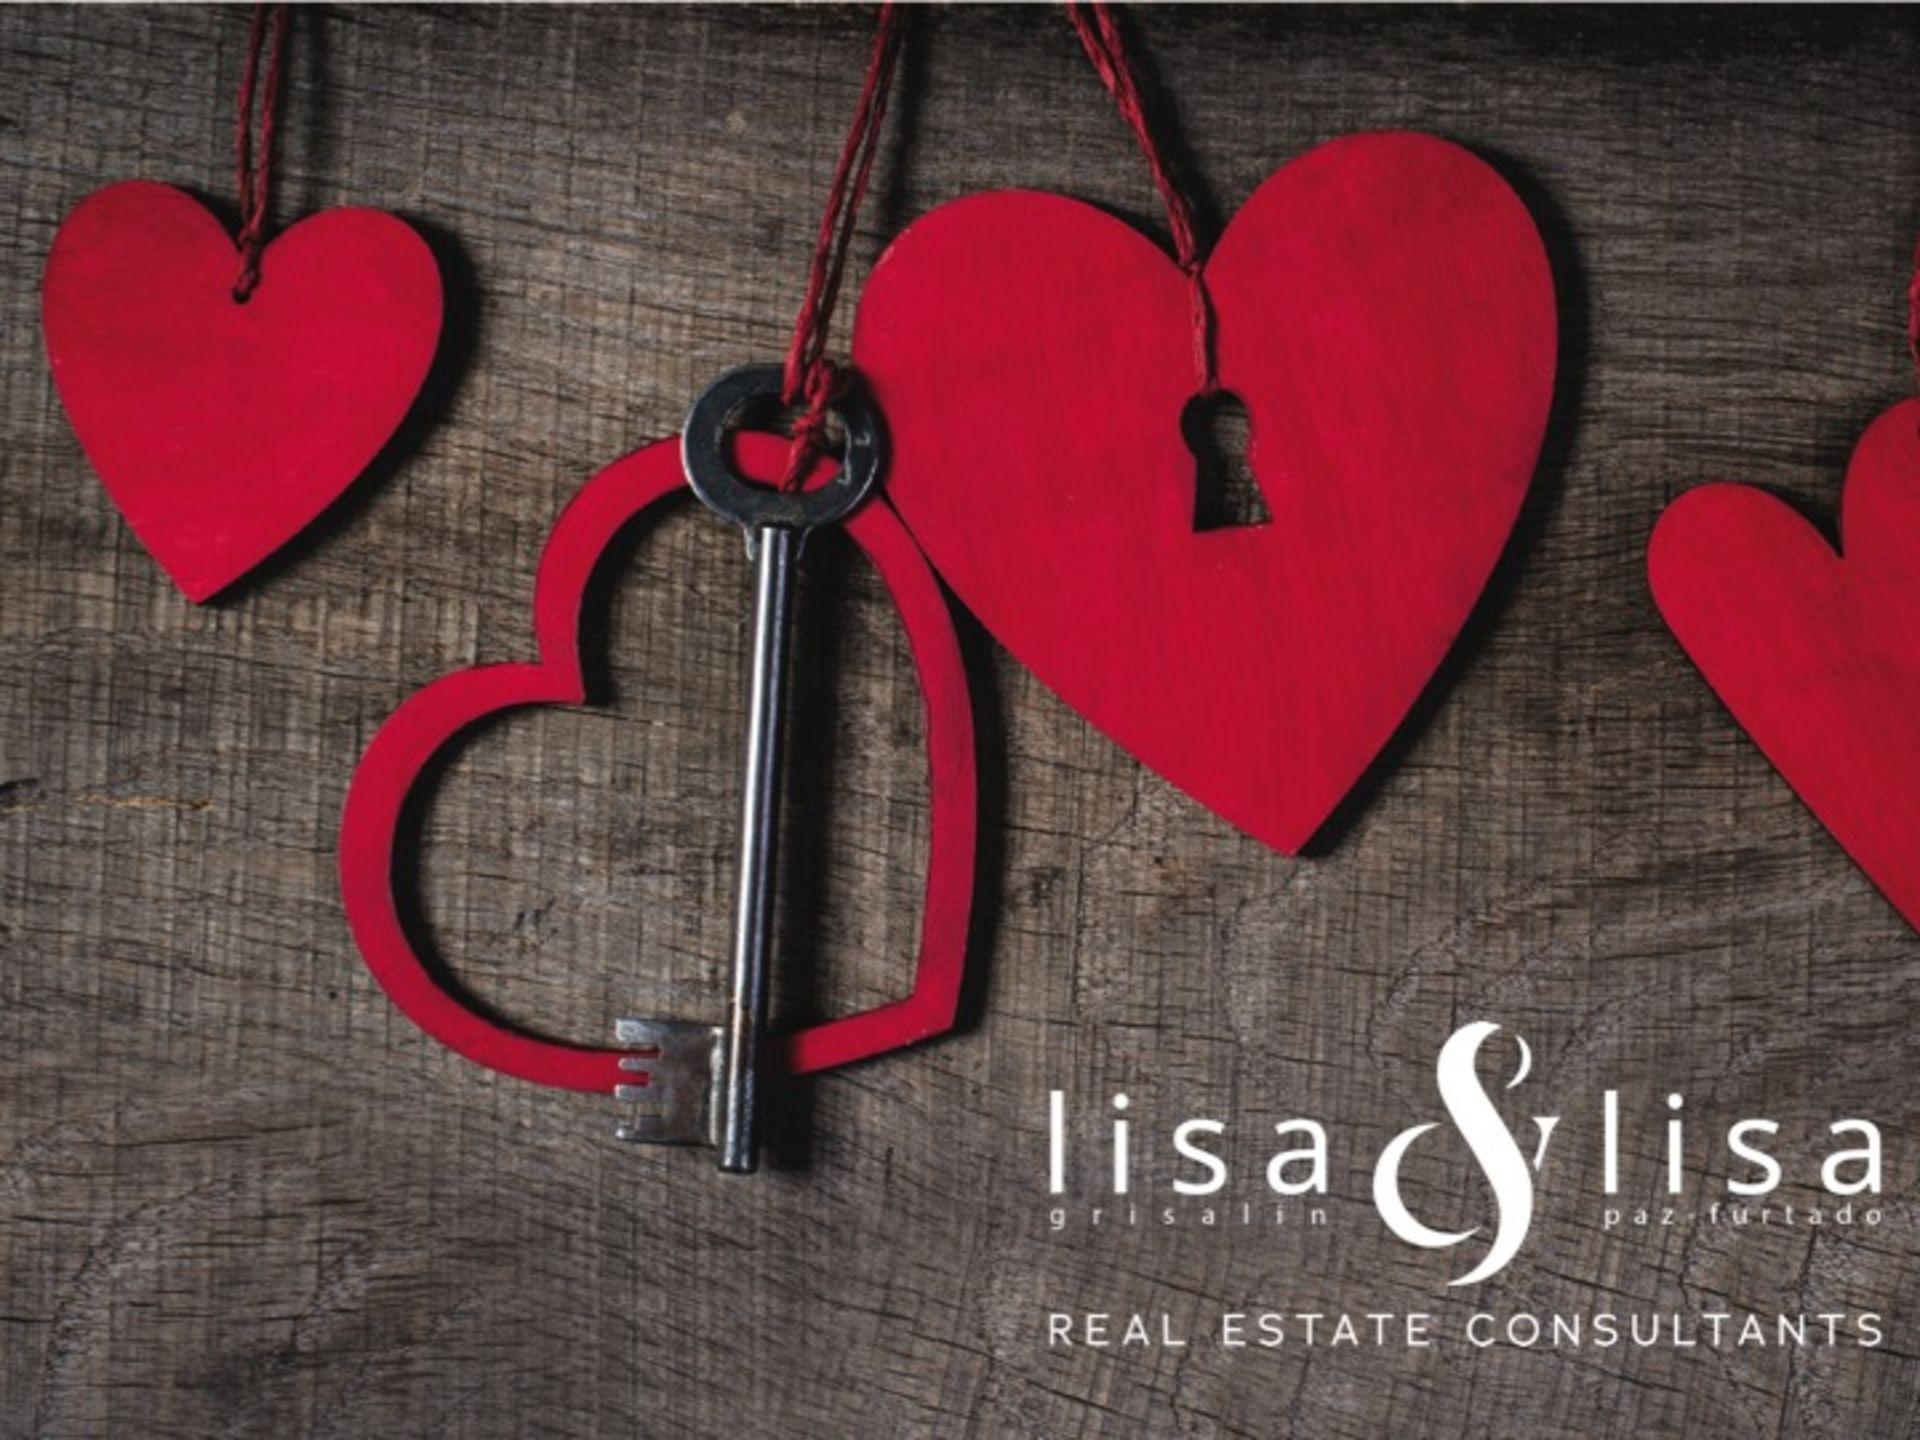 Share the Love February